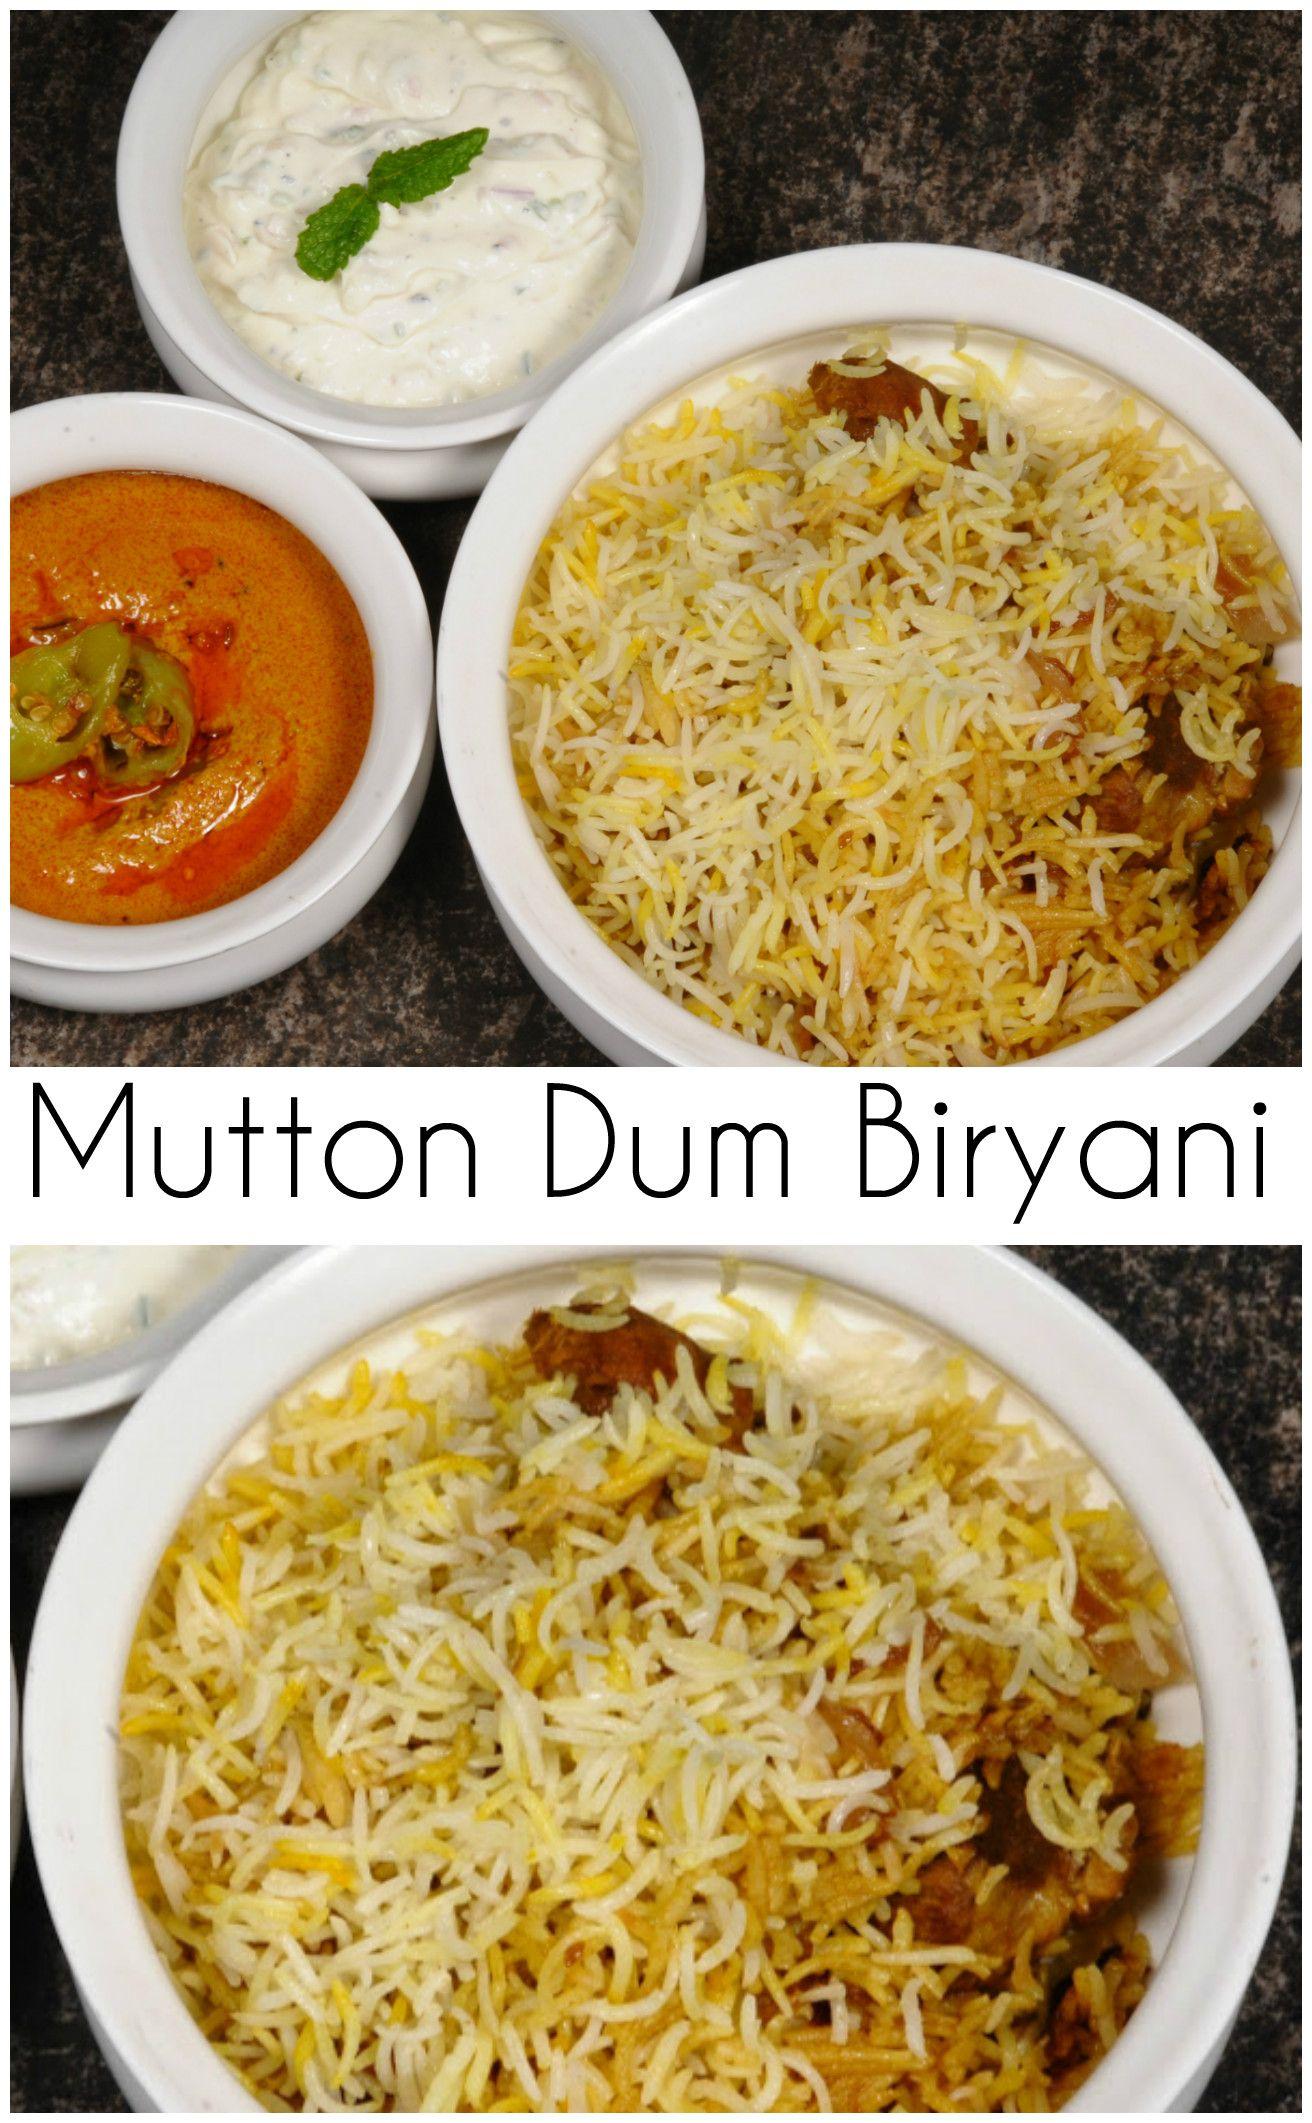 recipe: mutton dum biryani recipe in hindi [37]